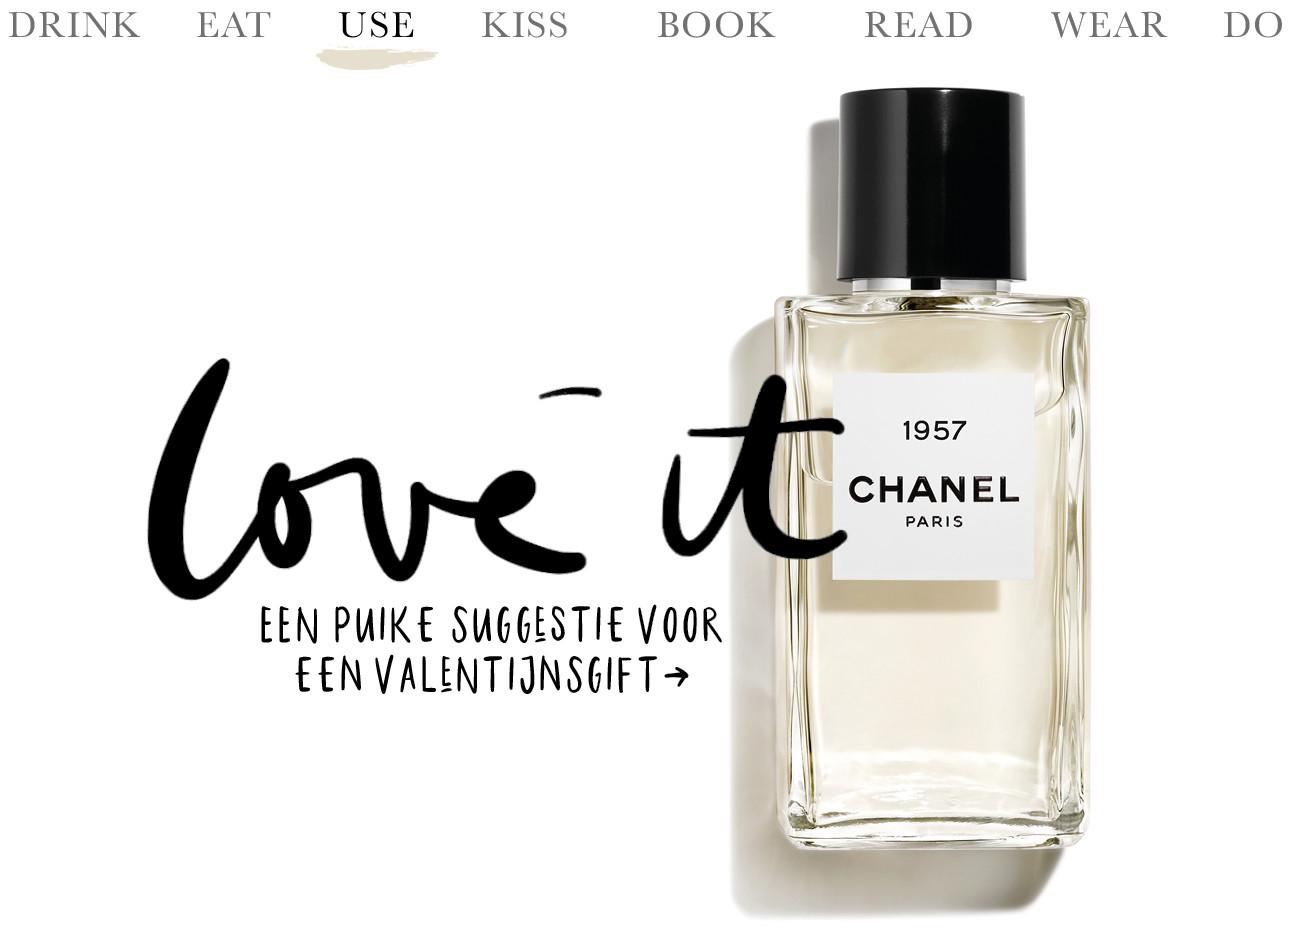 parfum Chanel 1957